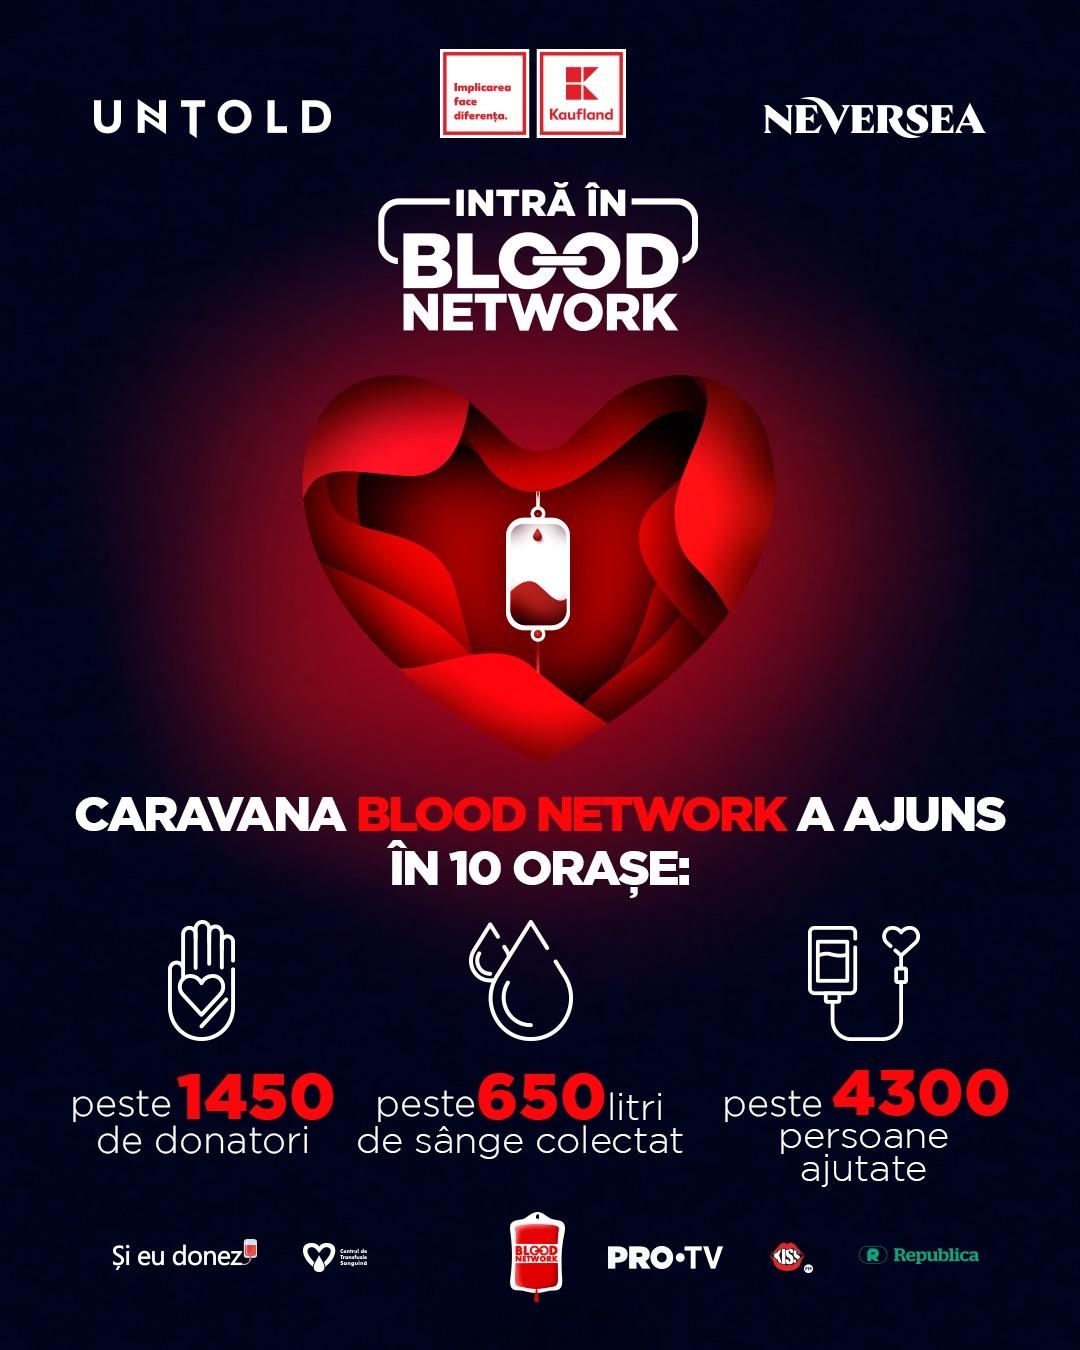 S-a încheiat cea de-a șasea ediție a campaniei Blood Network